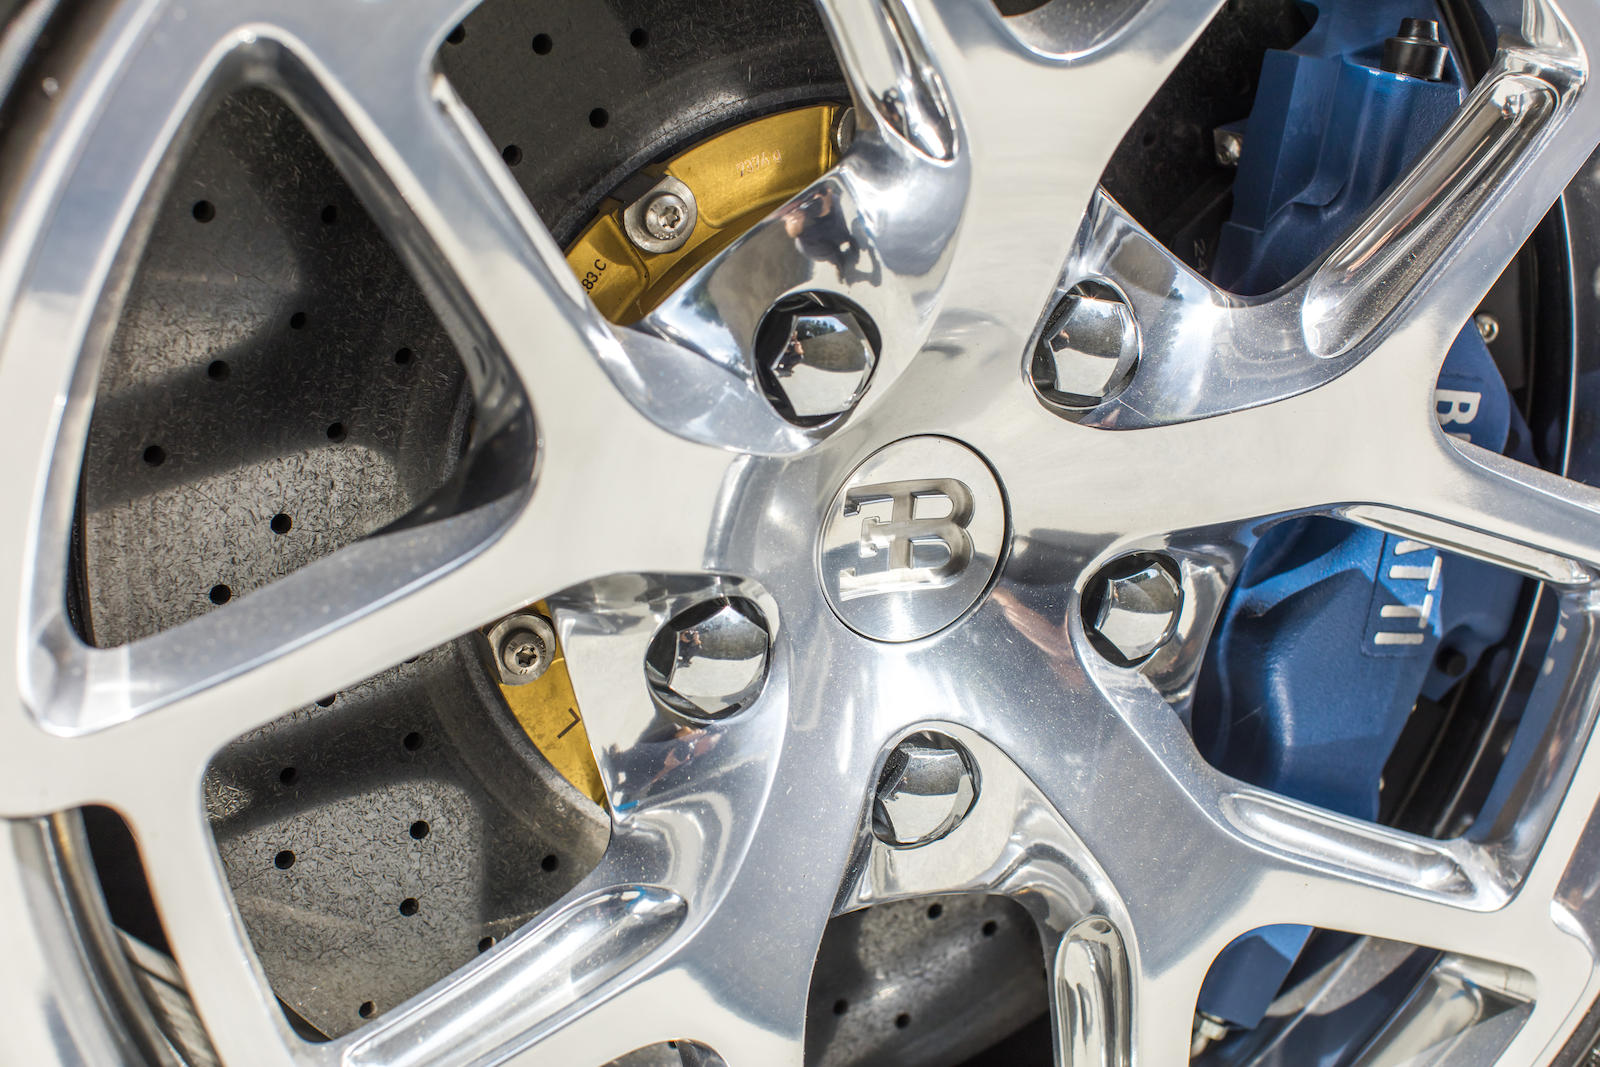 Bugatti Veyron wheel brake detail